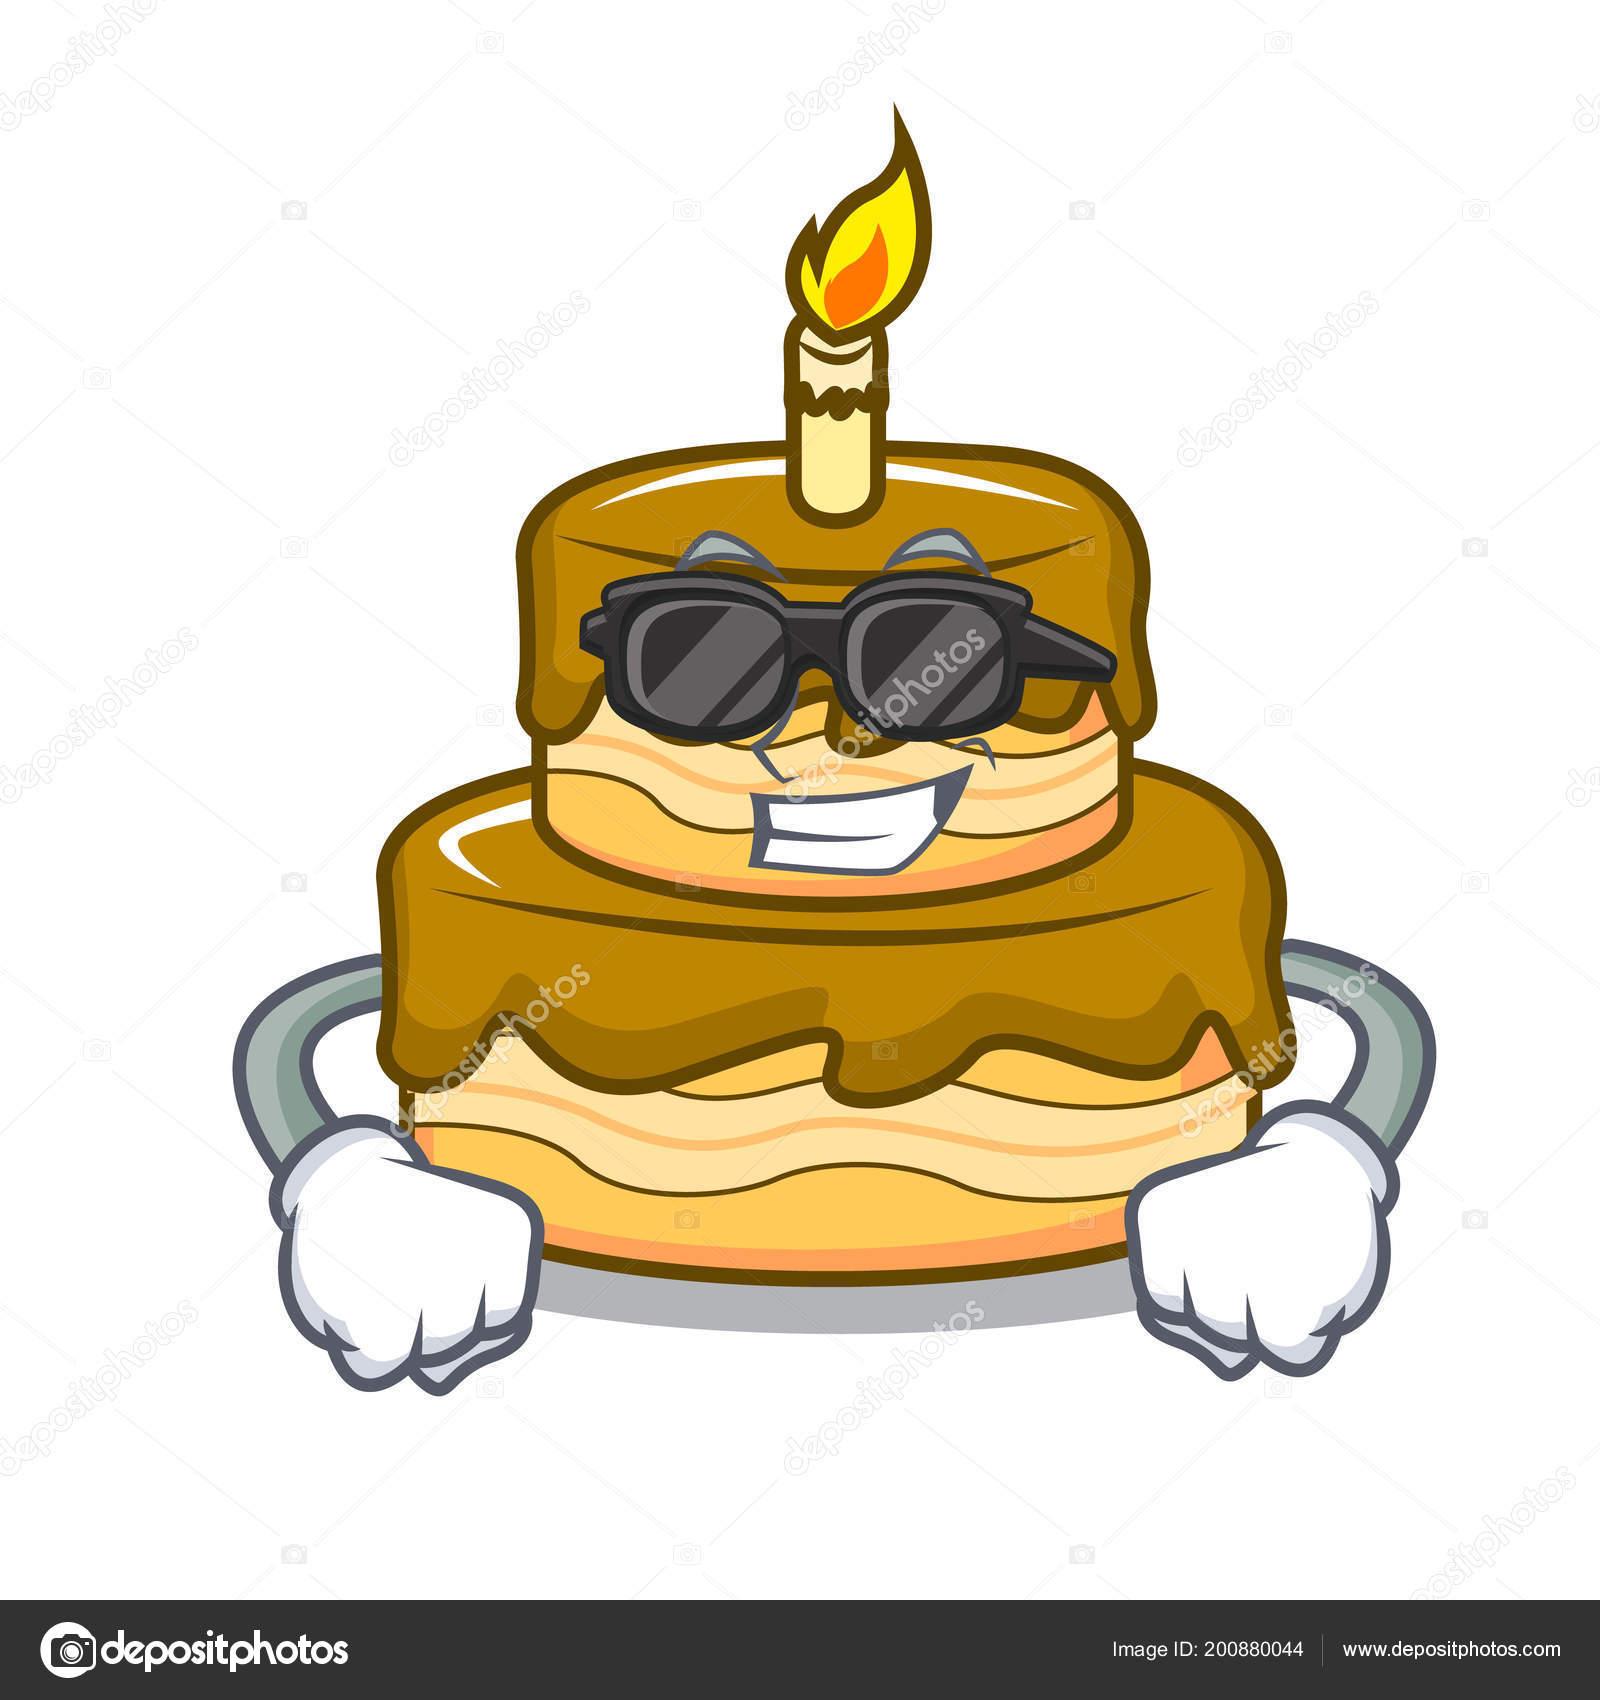 Super Coole Geburtstag Kuchen Charakter Cartoon Vektor Illustration